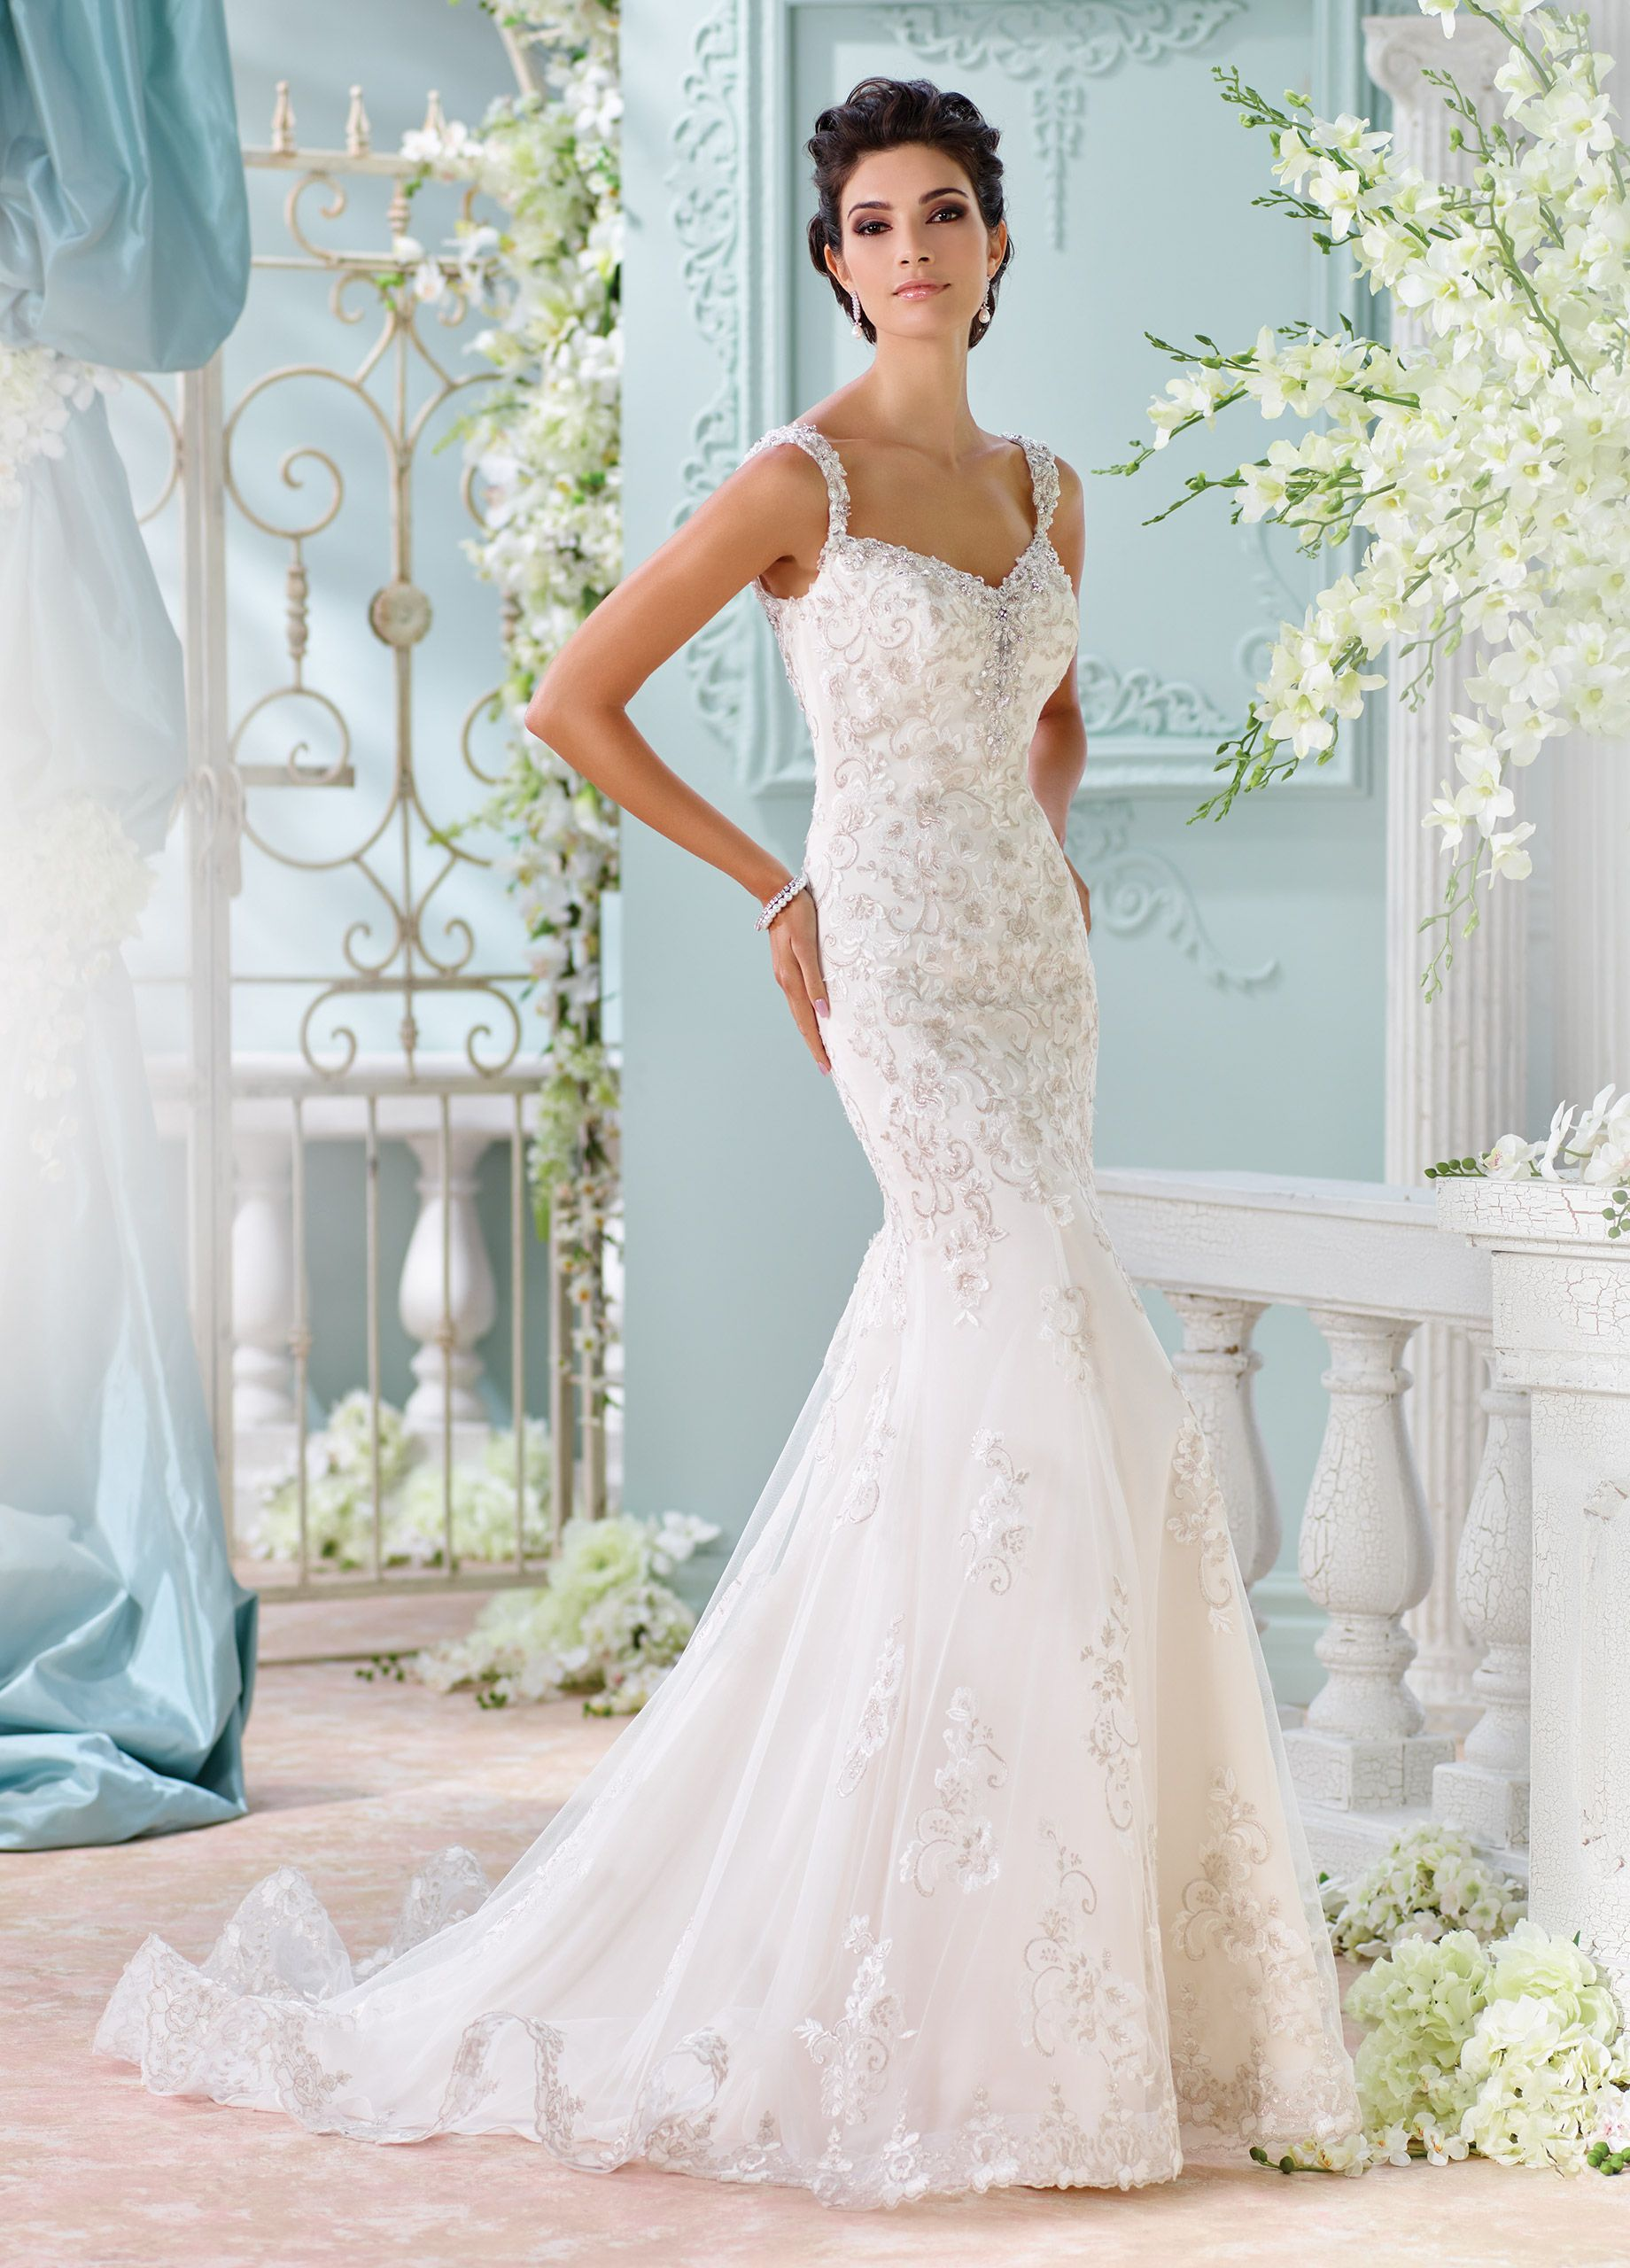 satin backless wedding dress – Fashion dresses